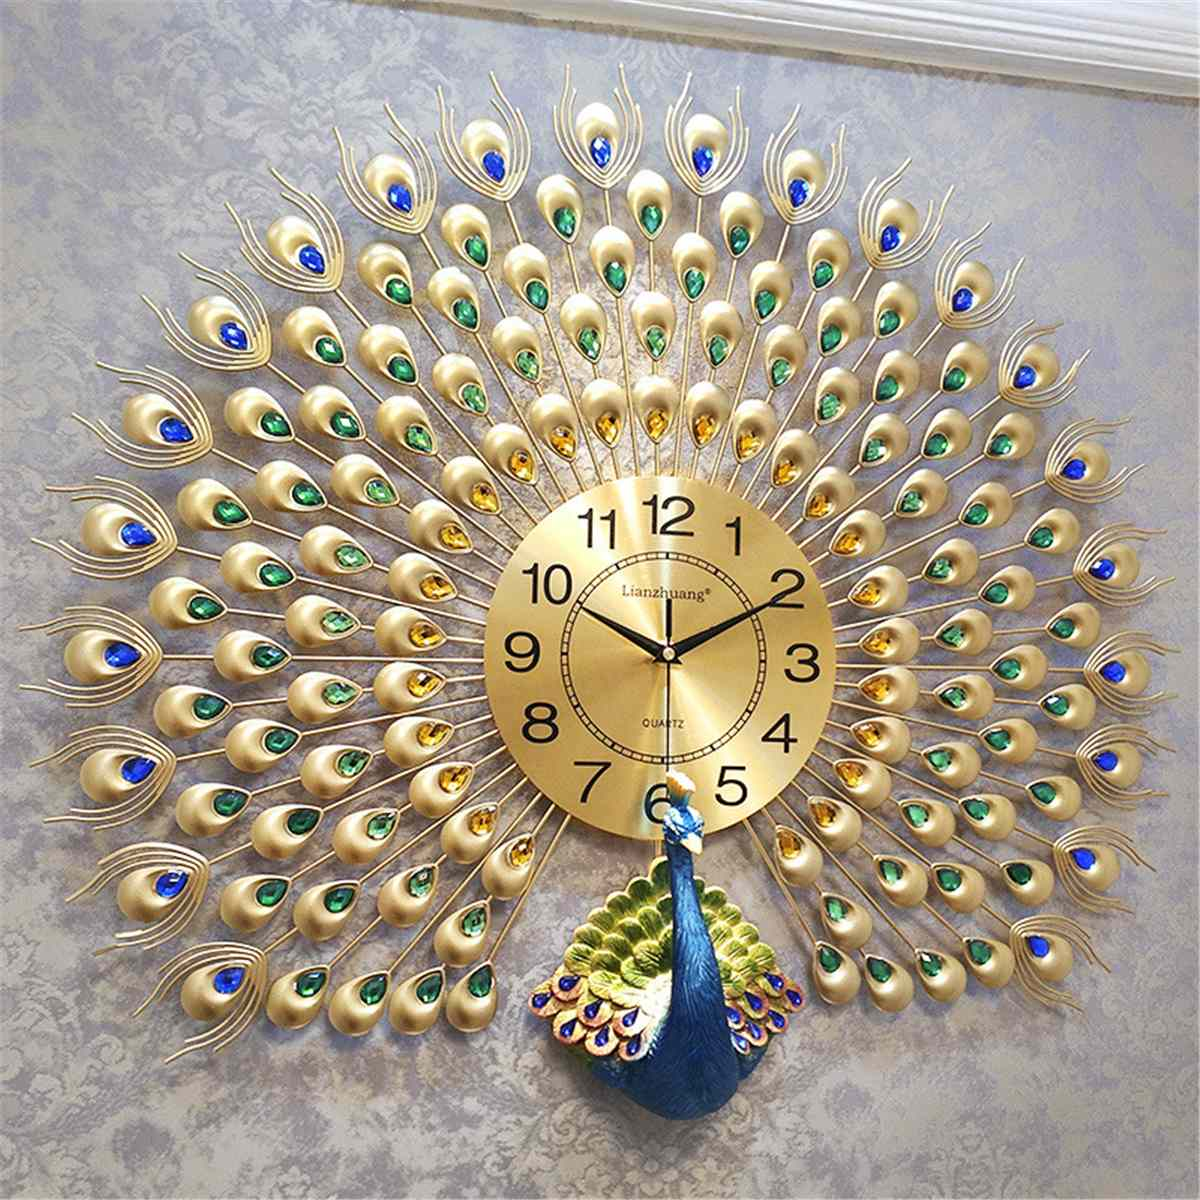 Peacocks Wall ClockCreative Silent Quartz Clock European Home Living Room Wall Decoration Clocks Metal Digital Wall Clocks